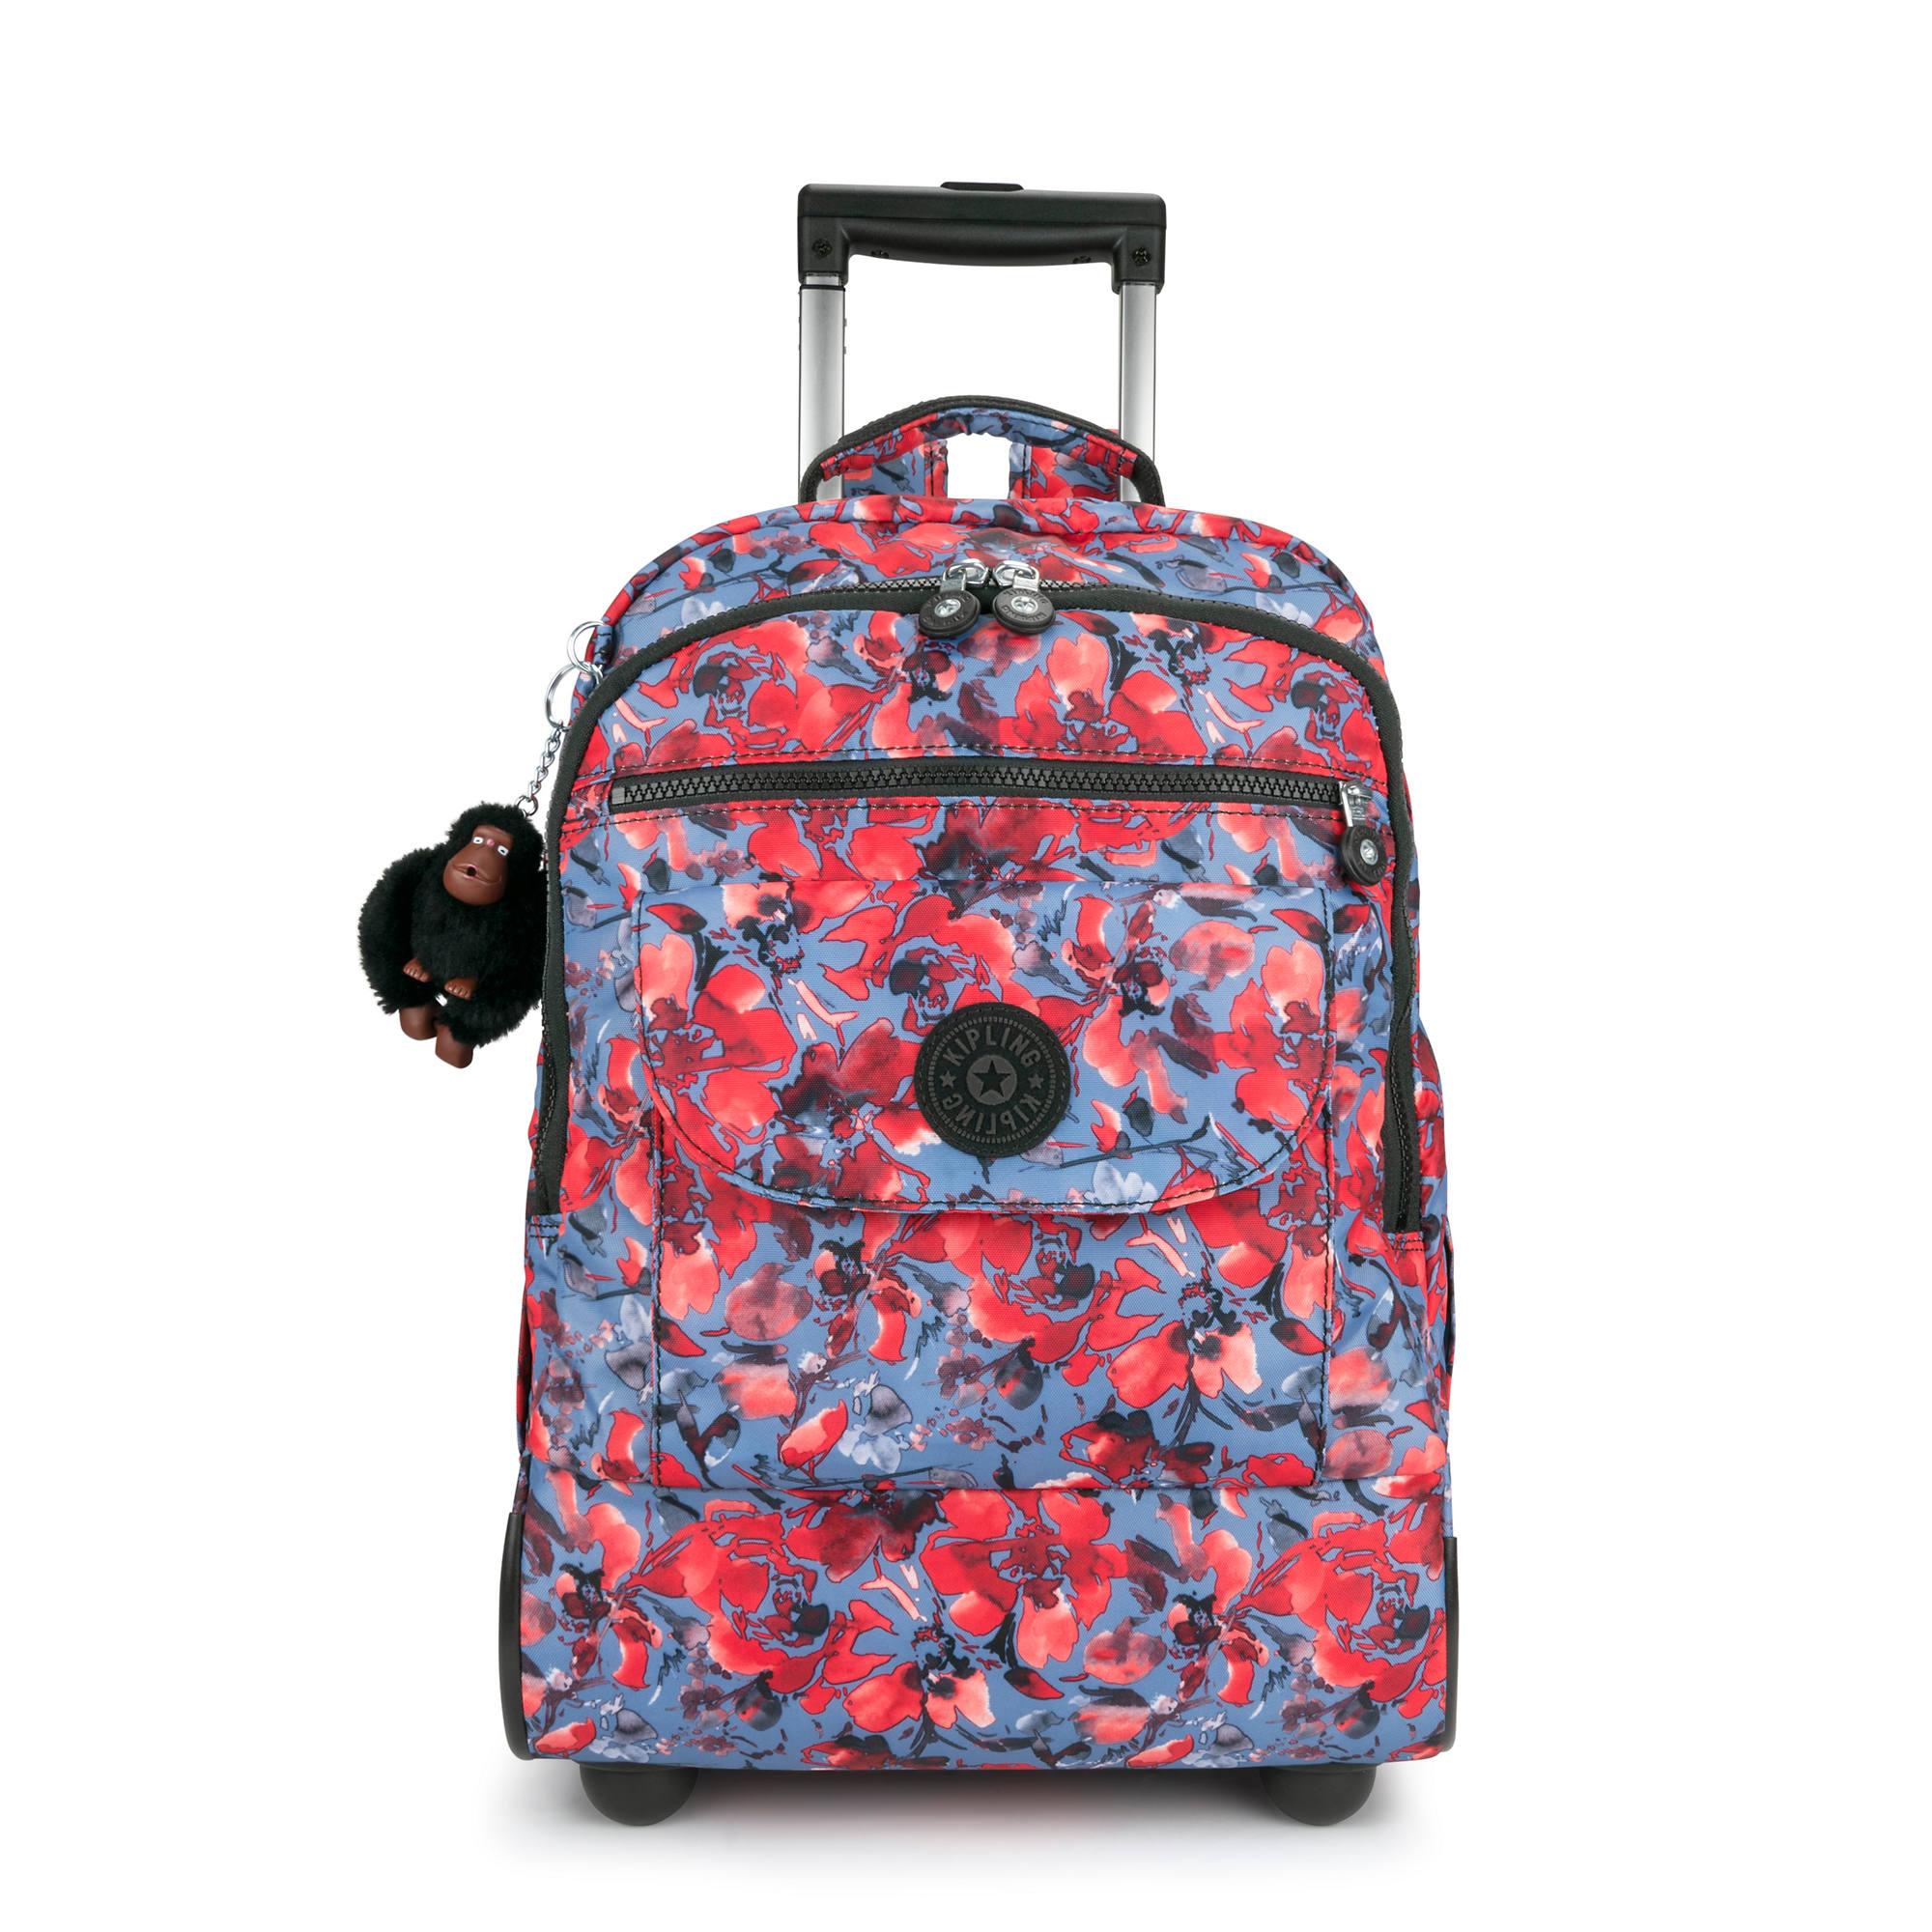 Sanaa Large Printed Rolling Backpack  9c01251730d08